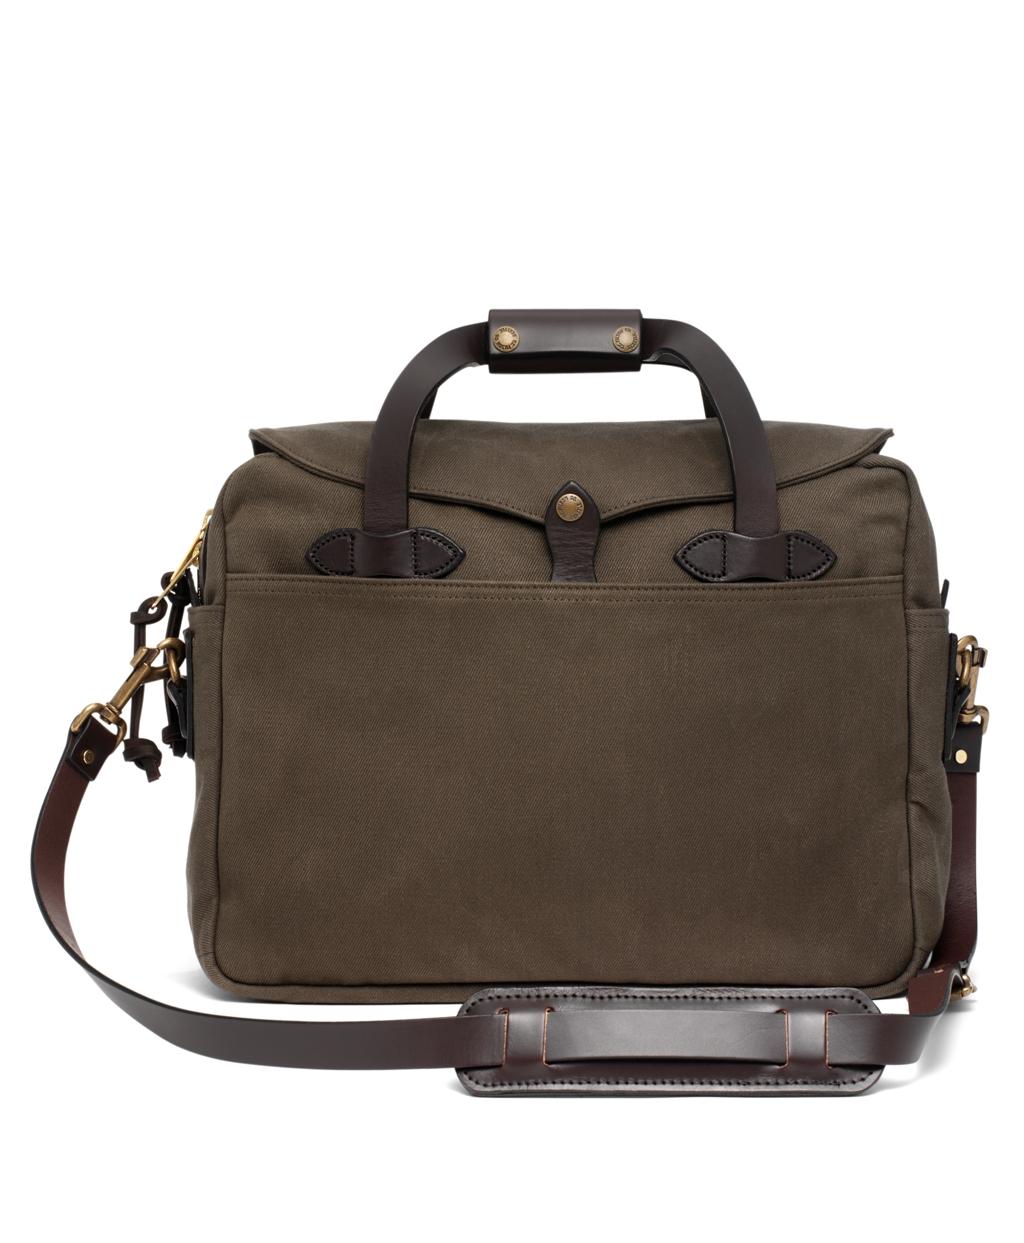 Filson Twill Computer Briefcase Bag Olive